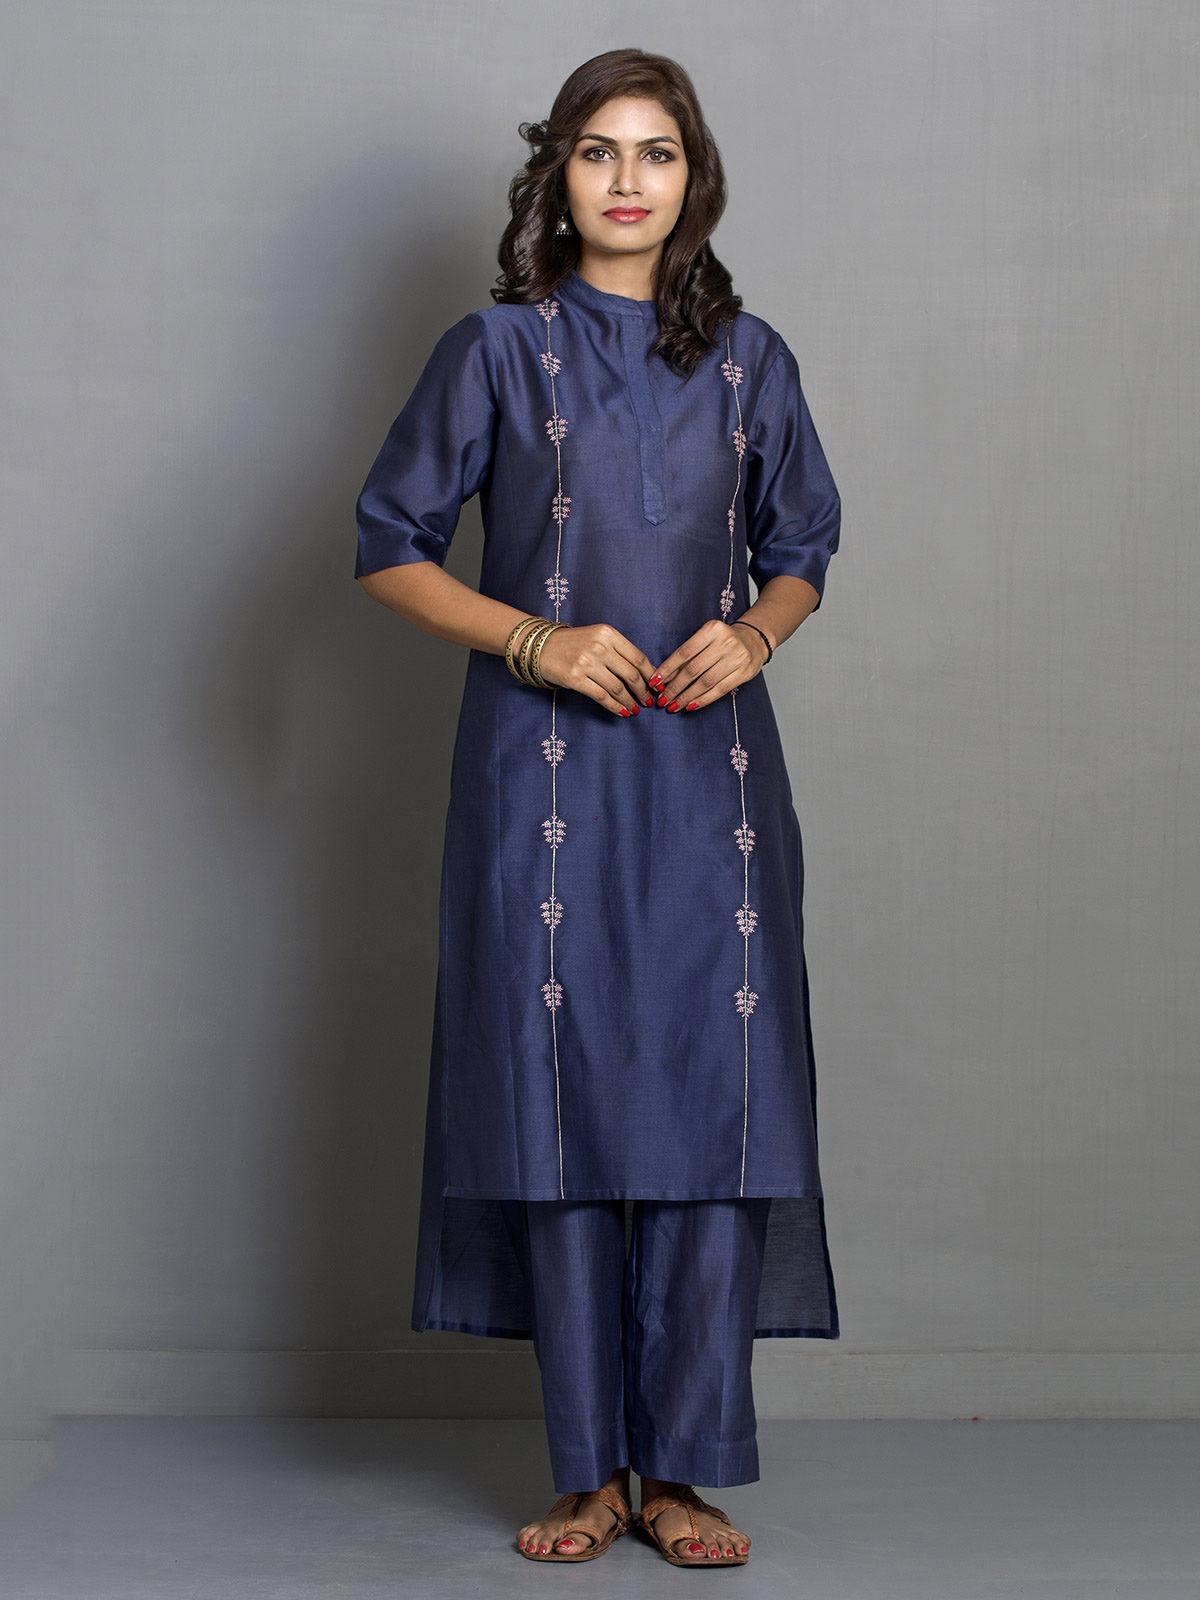 Blue Straight Asymmetric Chanderi Kurta with Embroidered Motifs